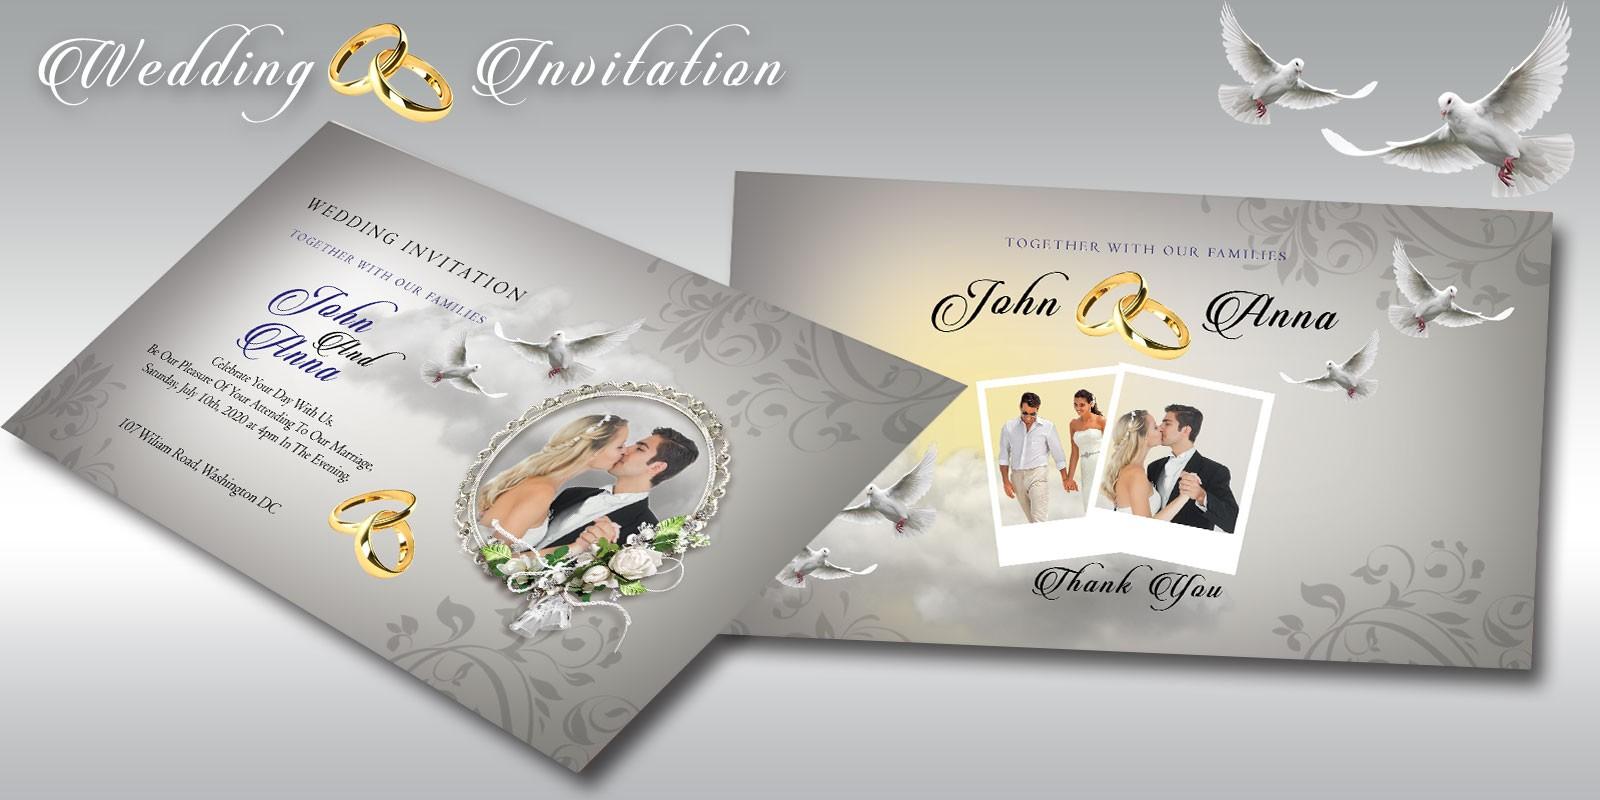 wedding invitation flyer template miscellaneous print templates codester. Black Bedroom Furniture Sets. Home Design Ideas